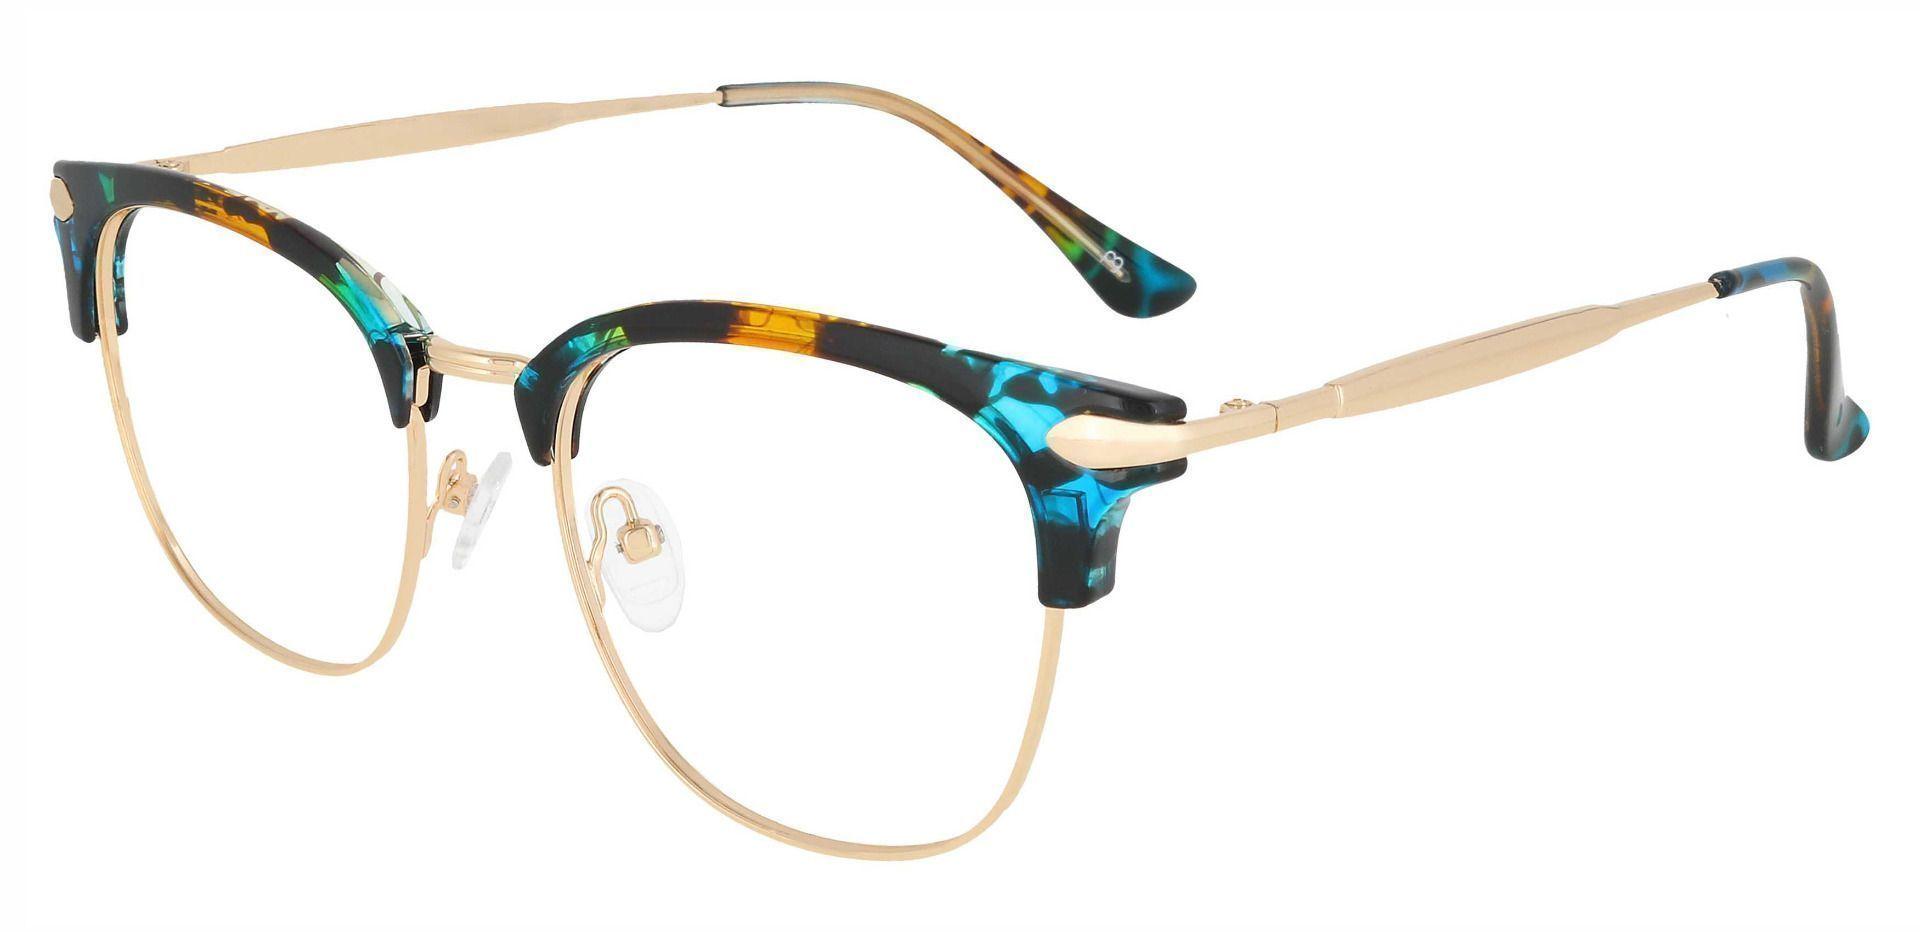 Webster Browline Prescription Glasses - Two